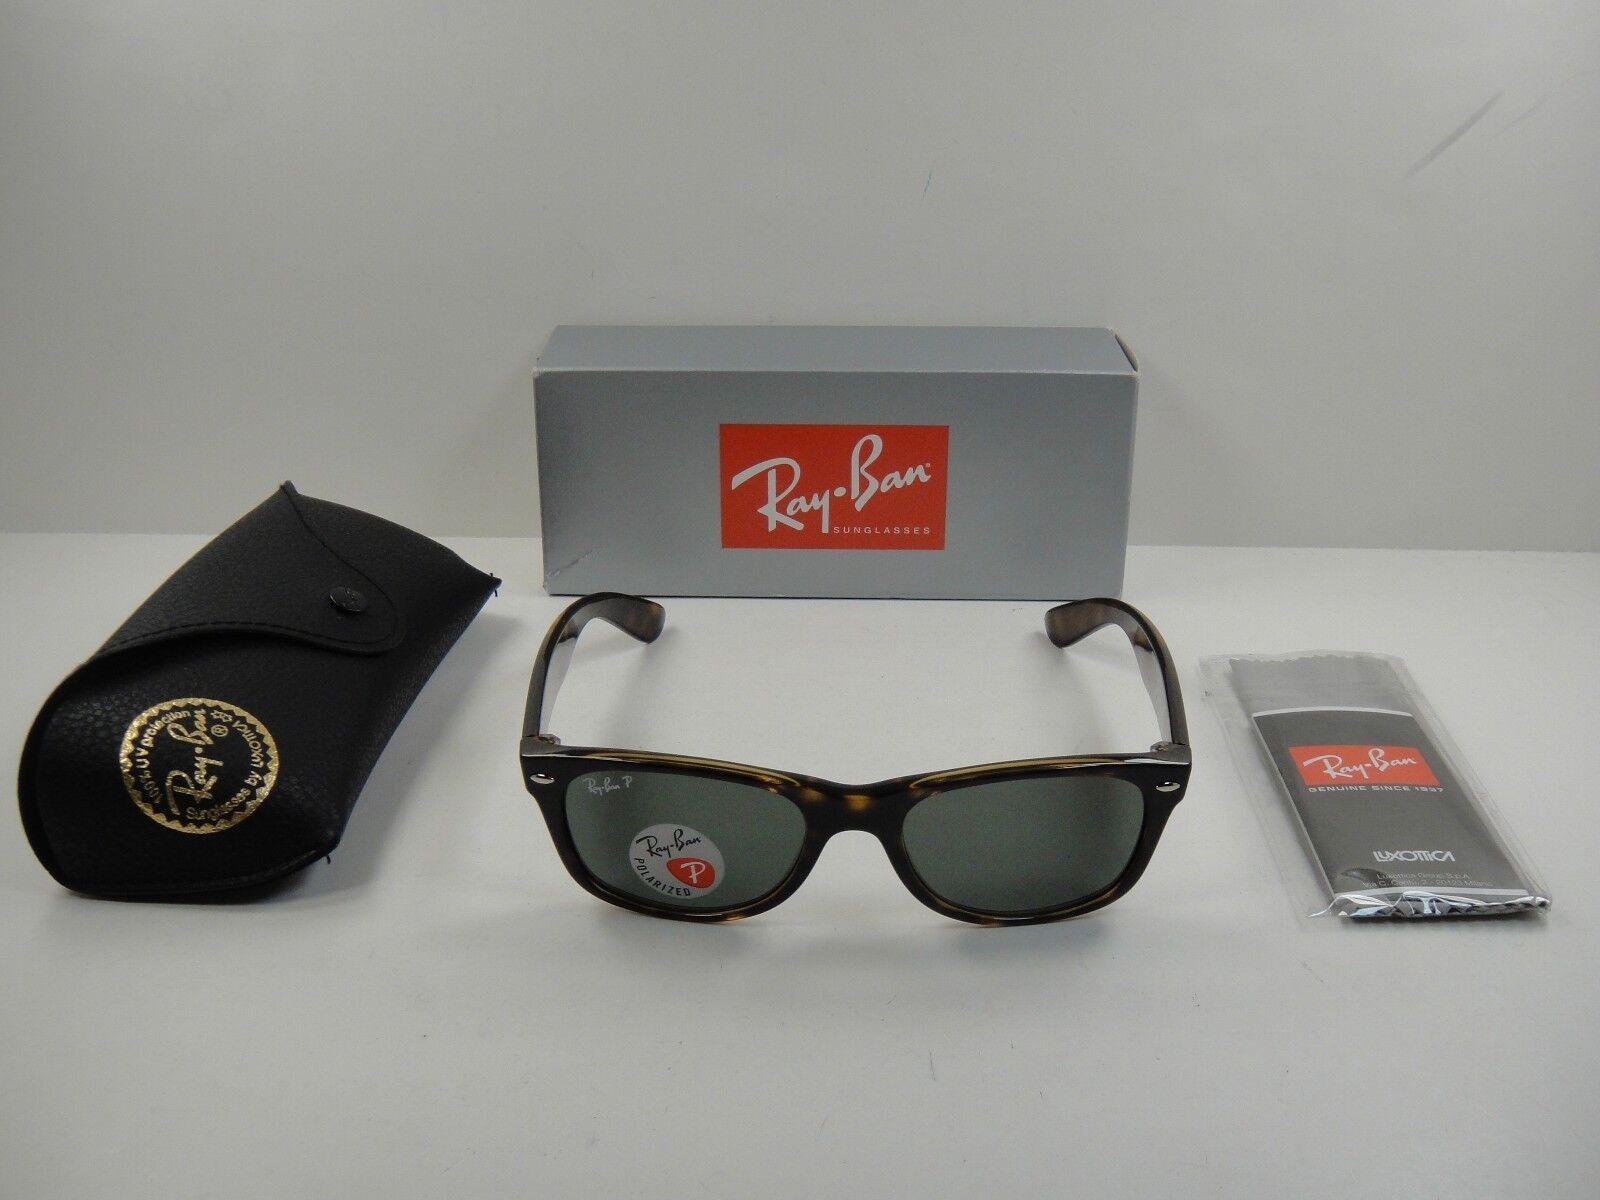 Ray Ban RB 2132 902/58 52mm Tortoise Polarized Shiny New